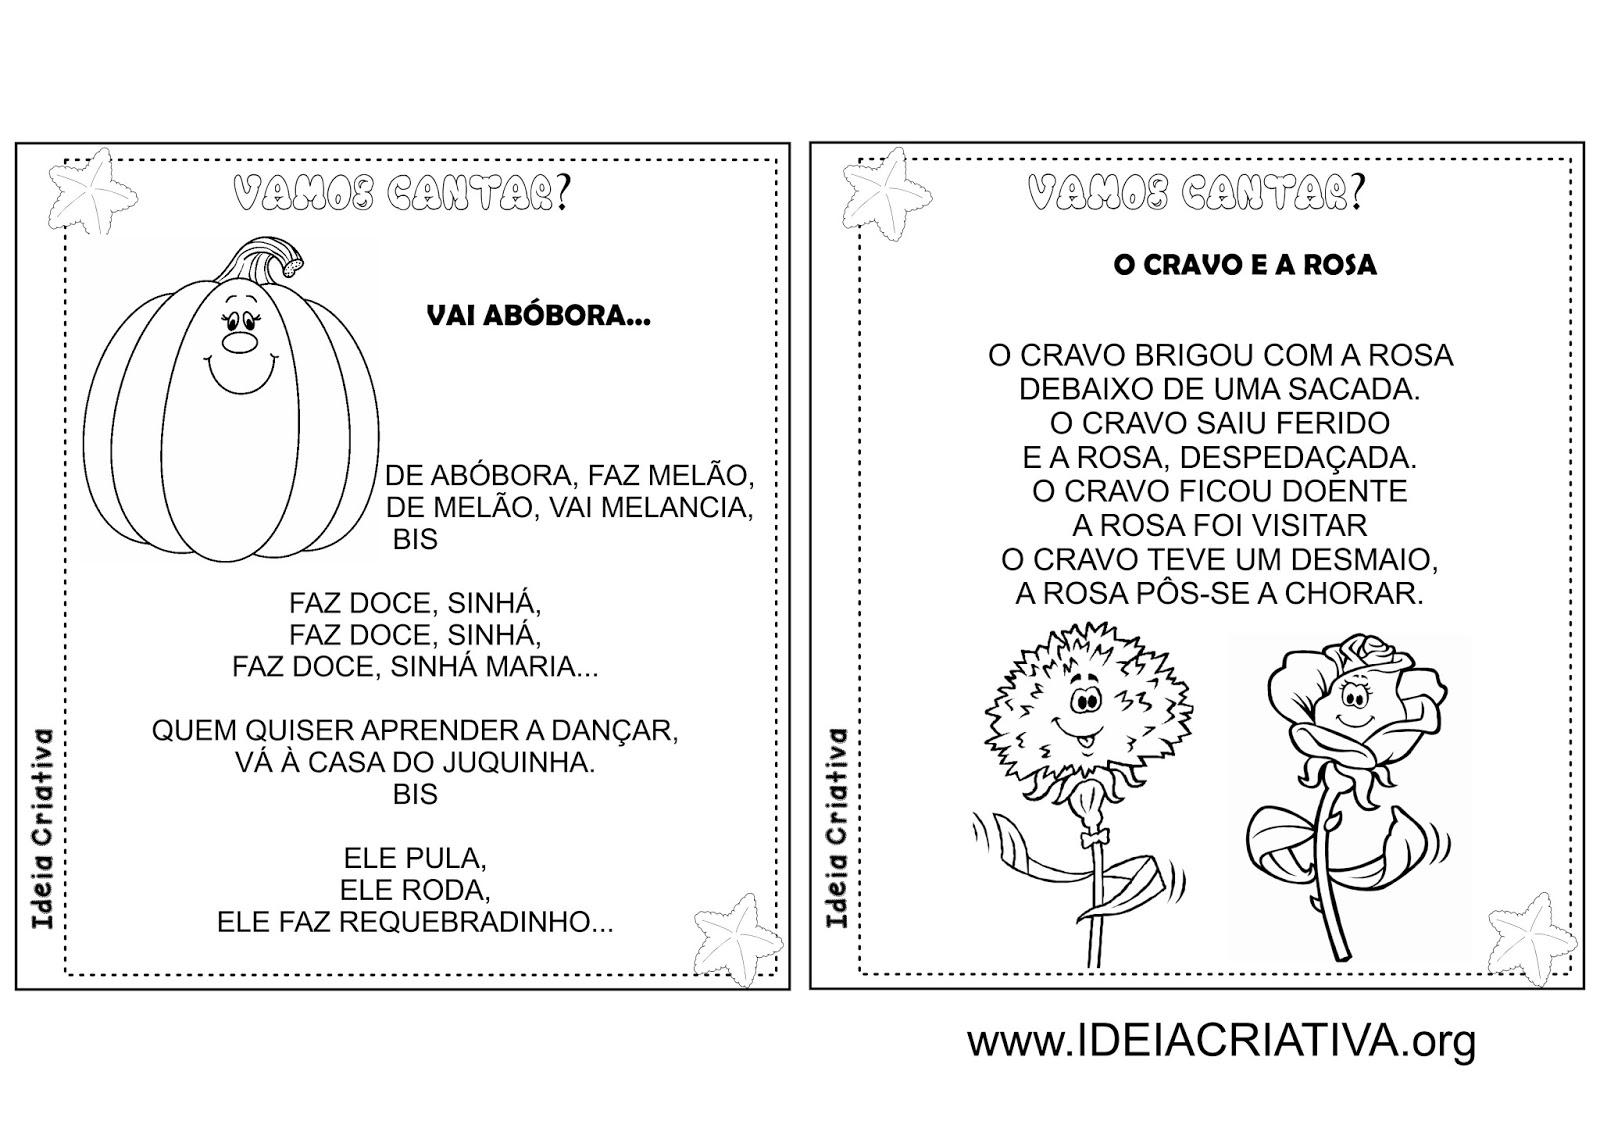 Amado Álbum Ilustrado Cantigas de Roda Folclore | Ideia Criativa - Gi  GJ71